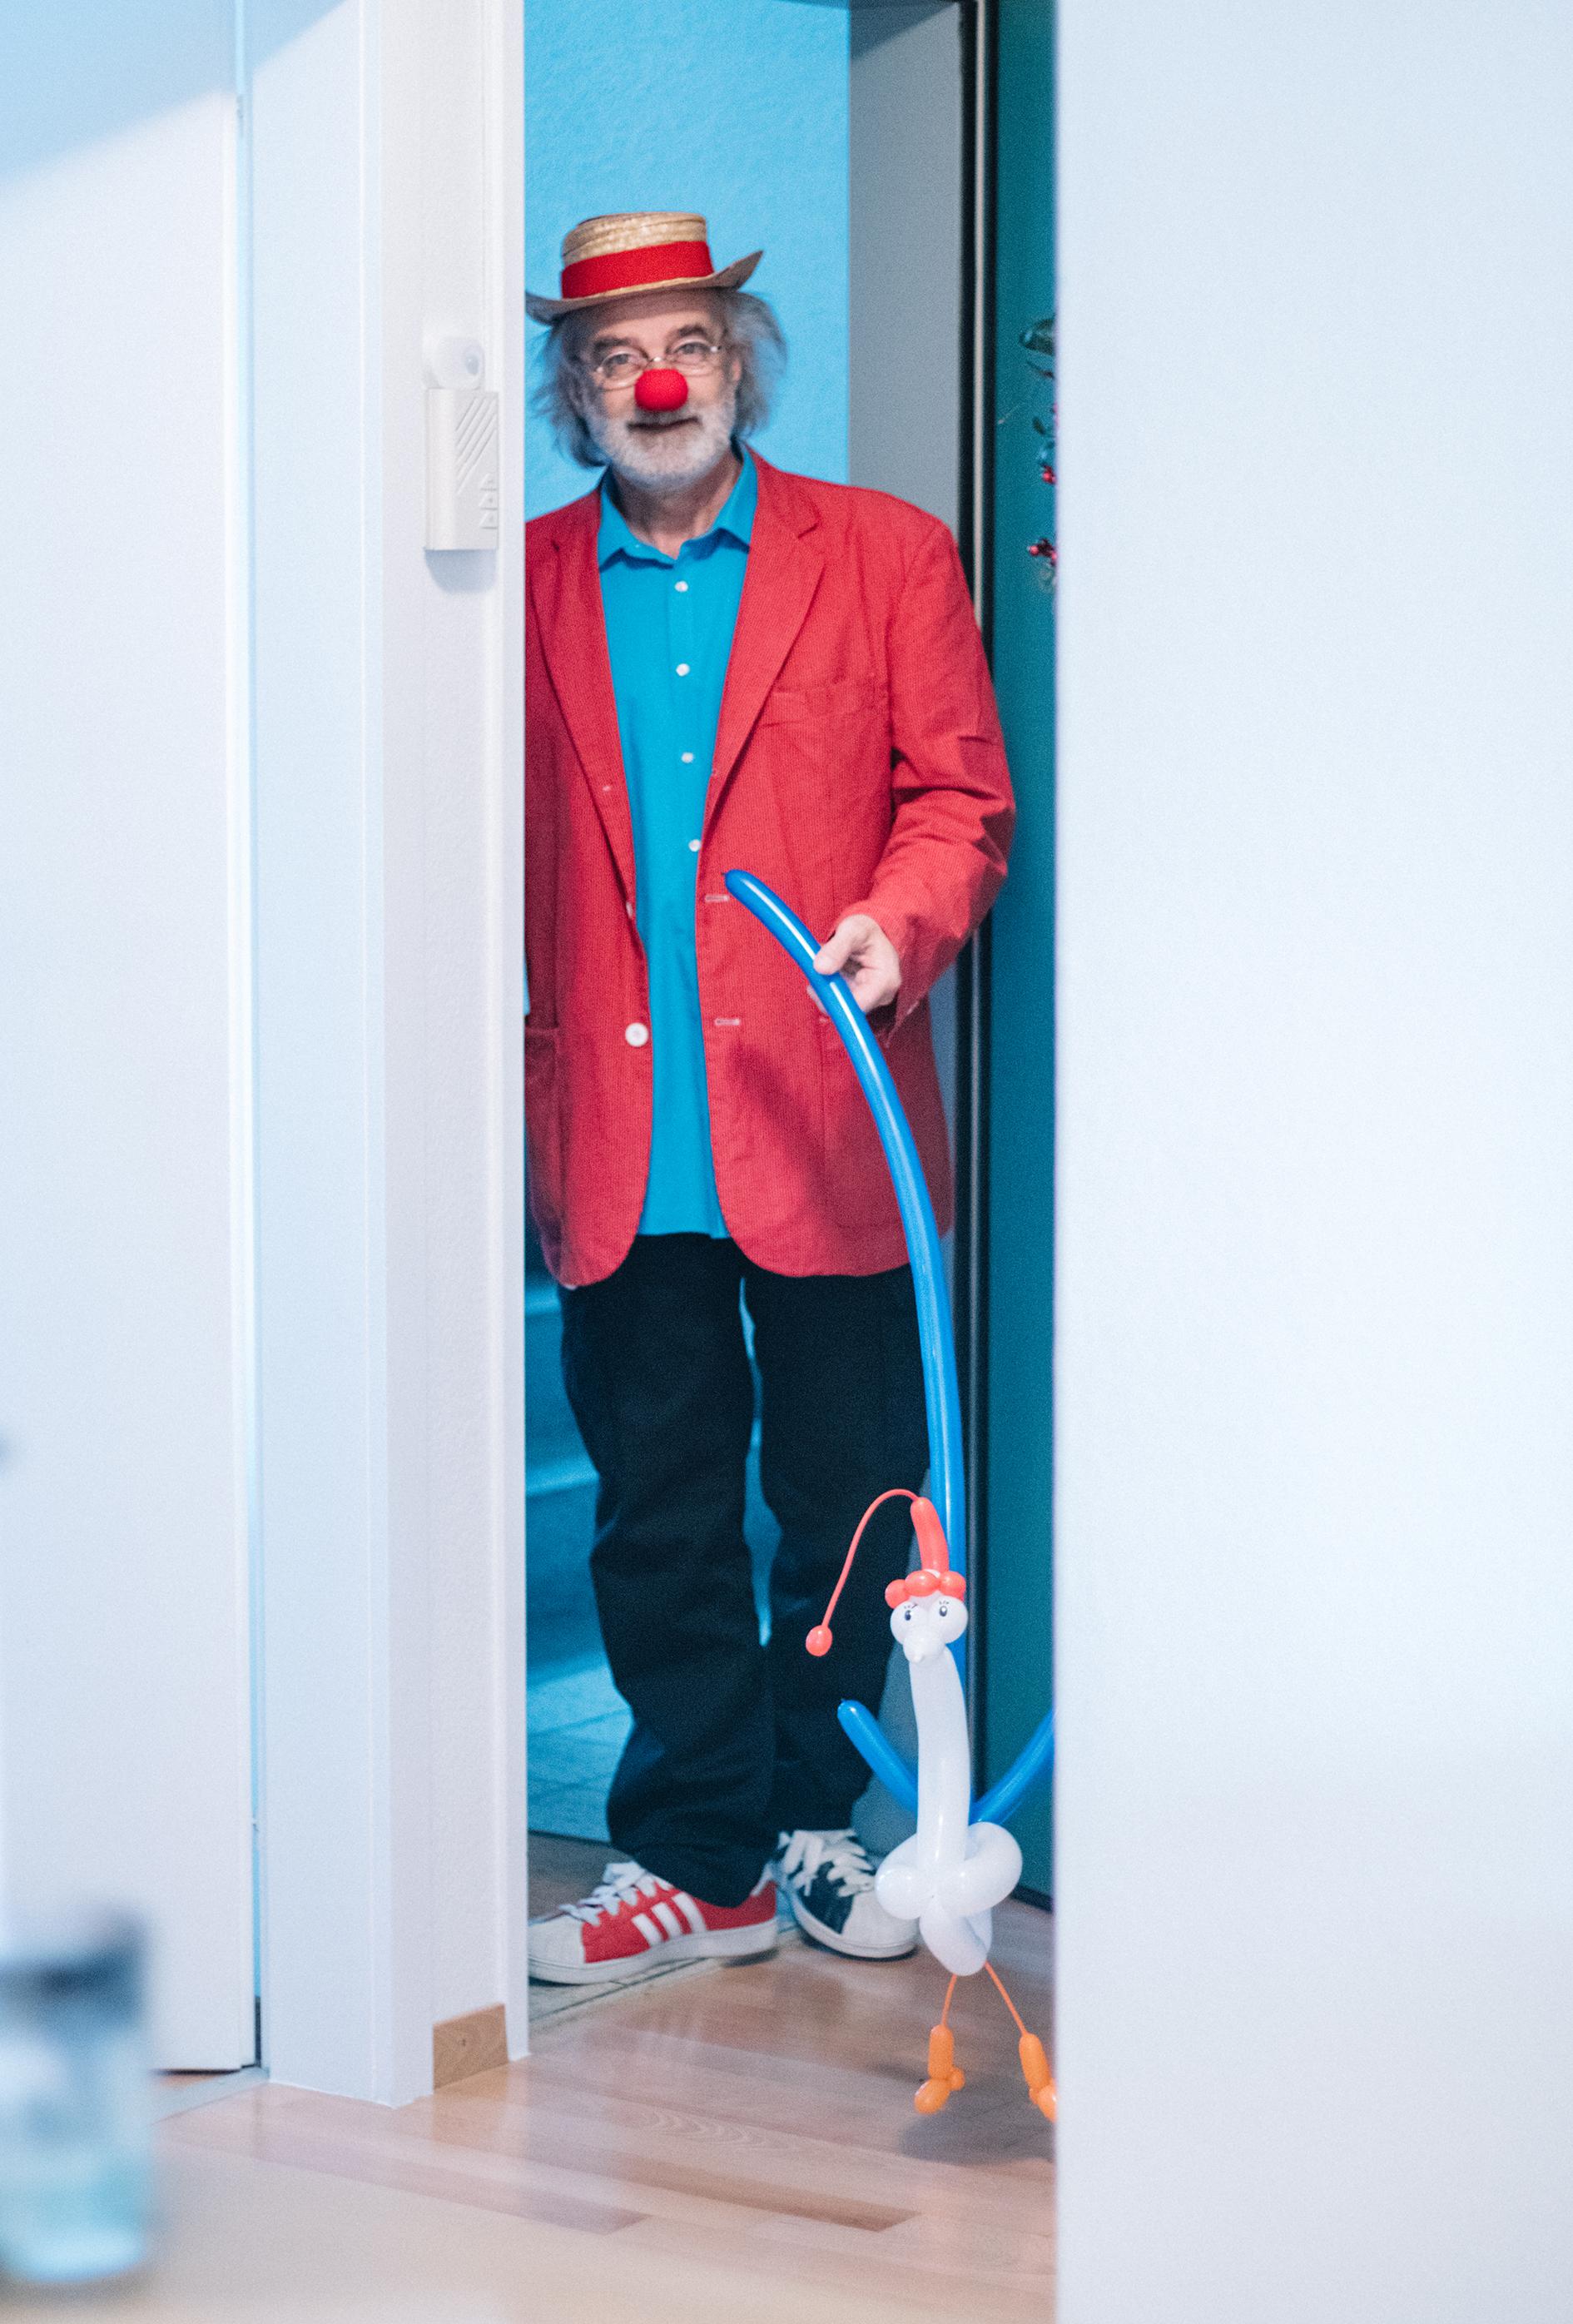 Clown Tschesli 1 - small.jpg